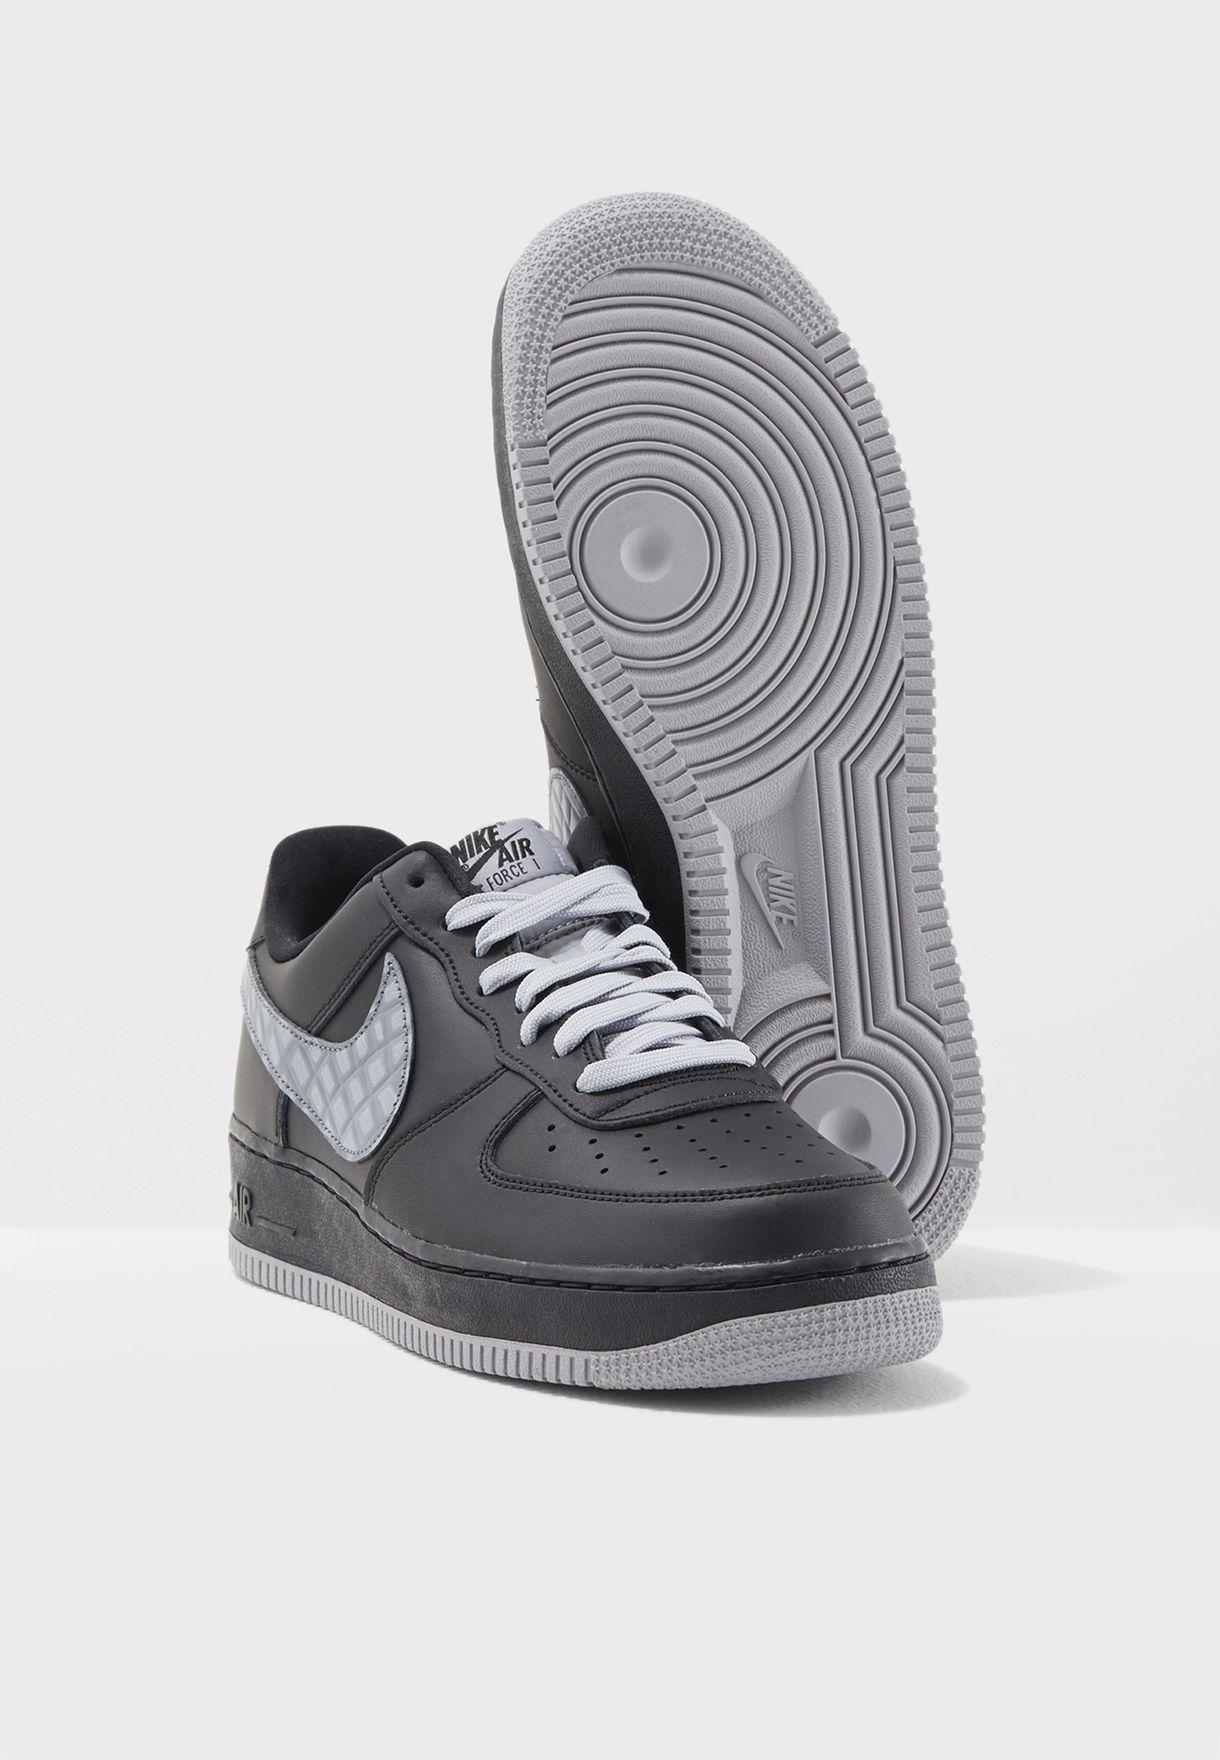 Shop Men Force '07 Black 823511 For In 1 Lv8 Nike Air 012 8PkwOnN0X